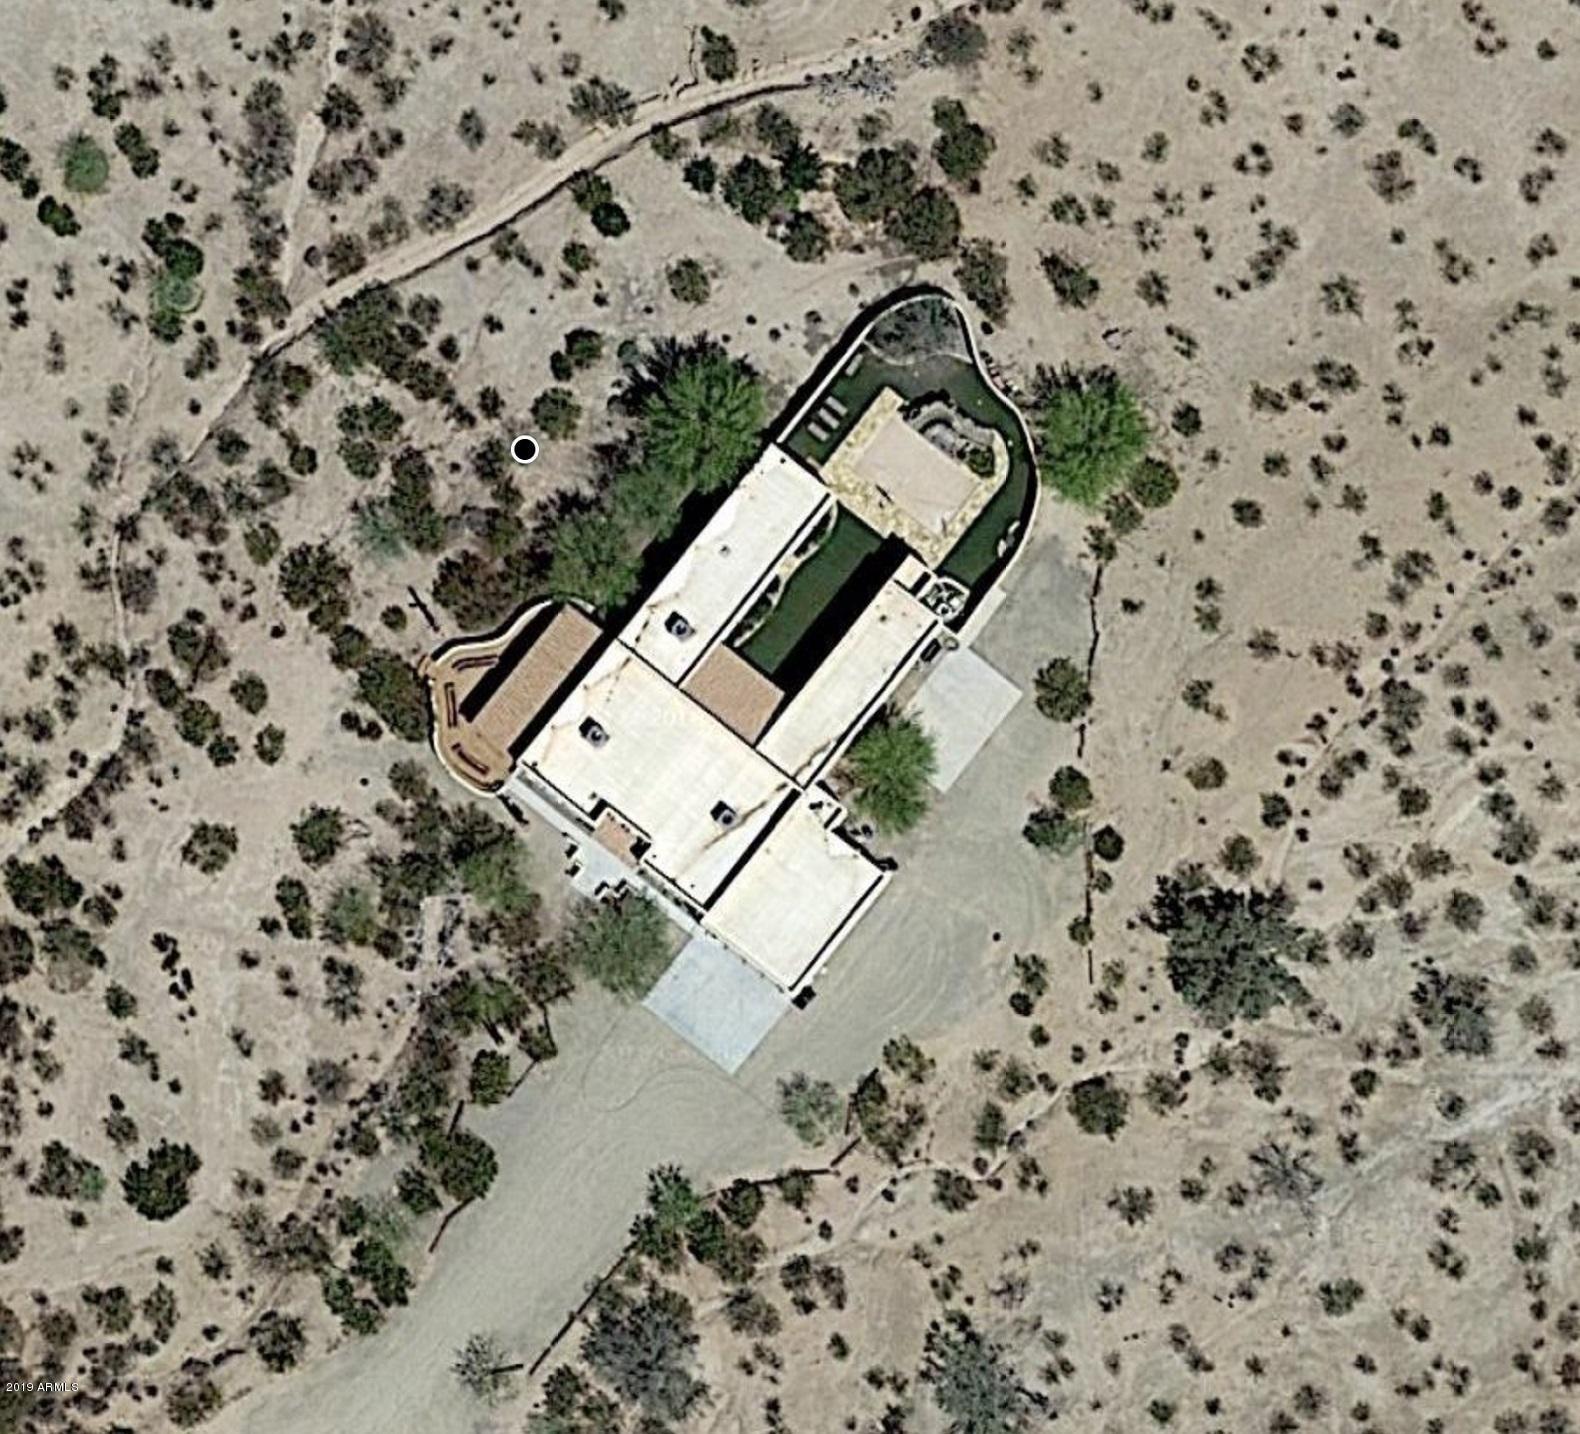 MLS 5879466 12662 W HARDIN RANCH Way, Casa Grande, AZ 85194 Casa Grande AZ Single-Story